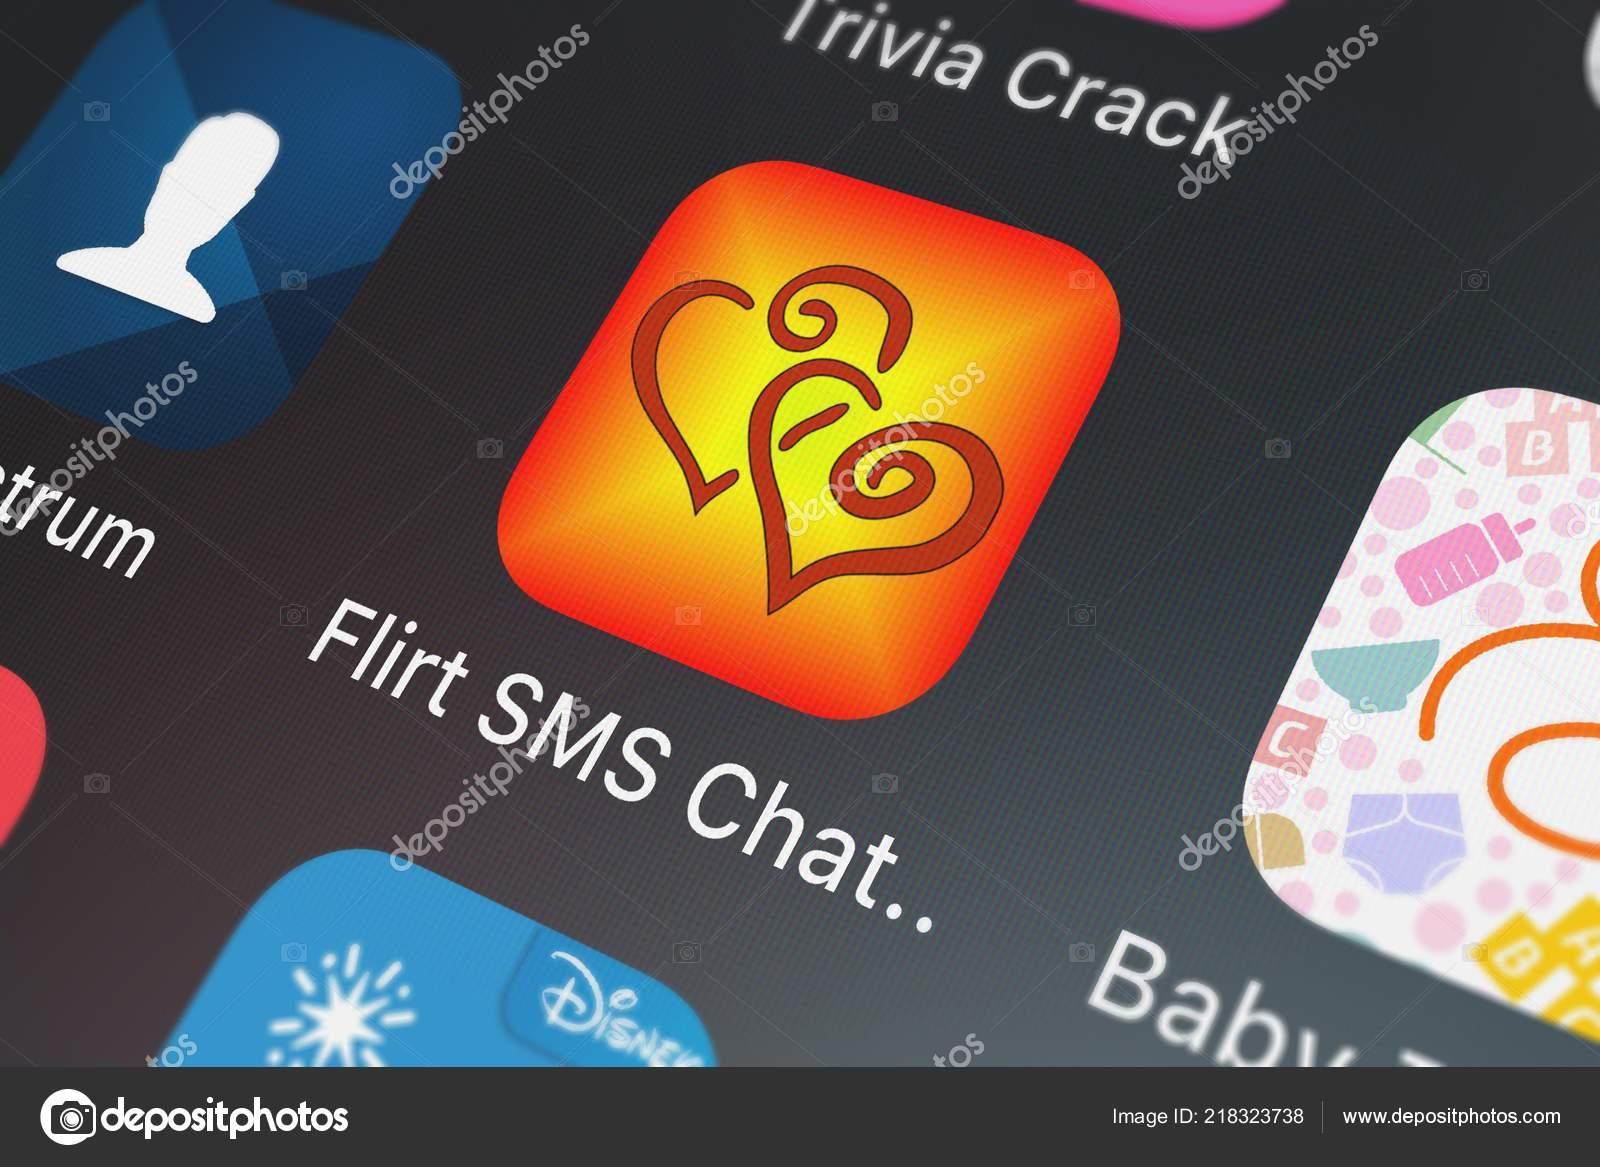 sms flirt chat